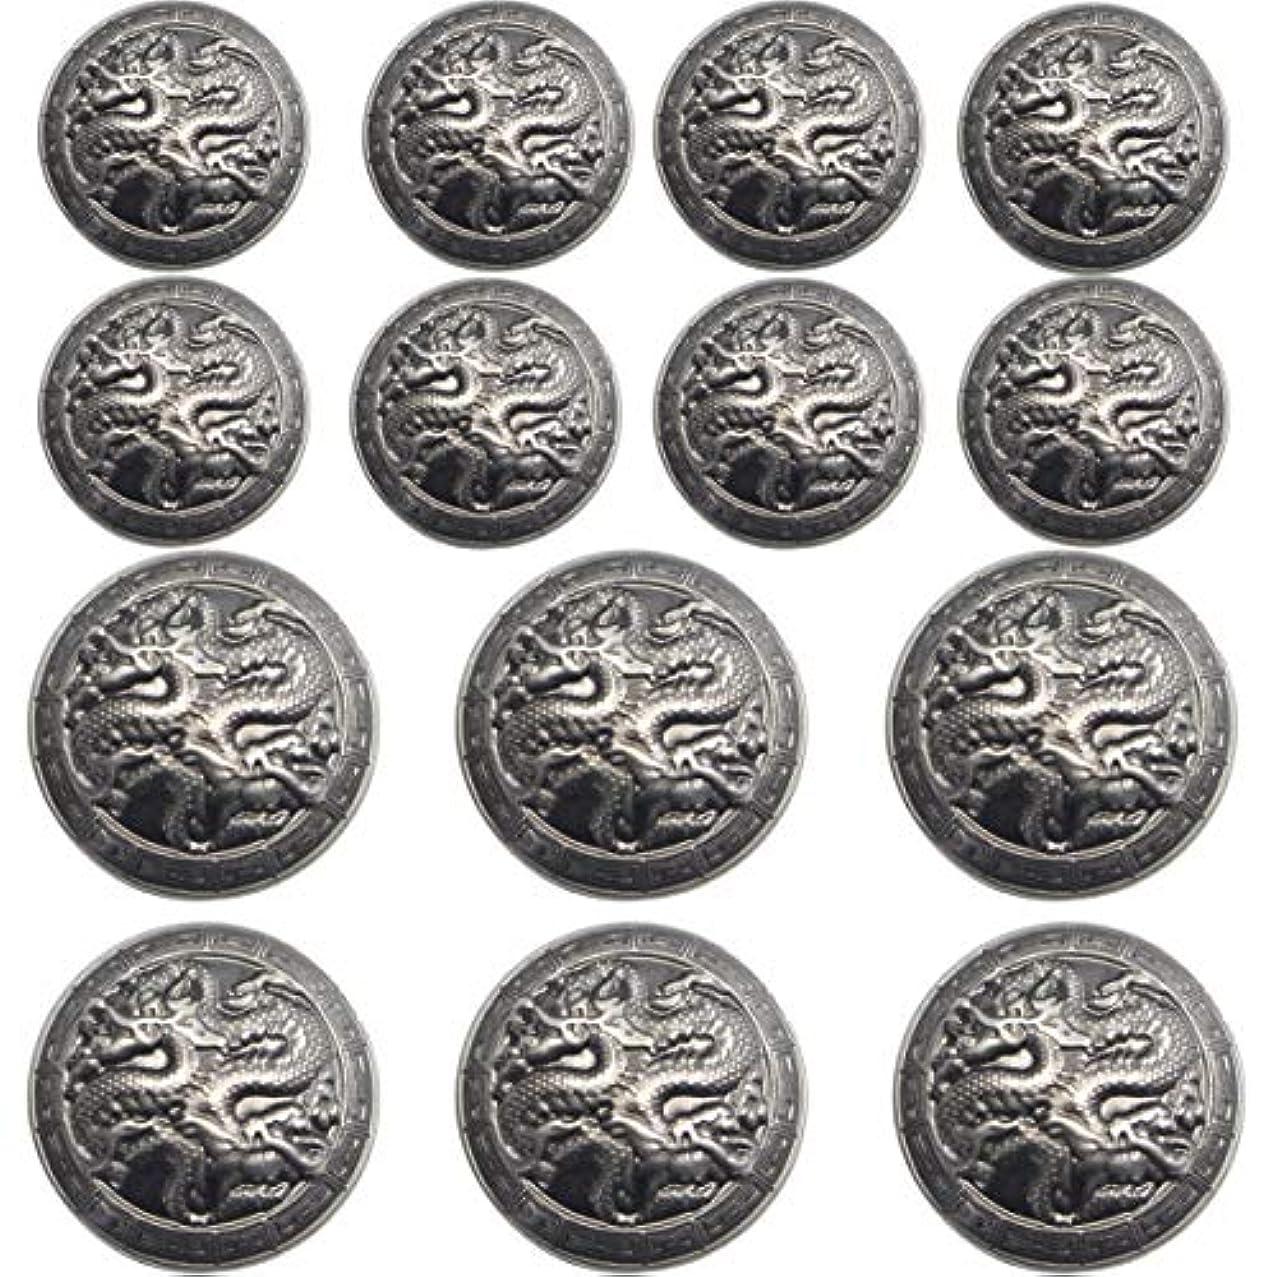 14 Piece Vintage Antiqued Silver Metal Blazer Button Set - Dragon - for Blazer, Suits, Sport Coat, Uniform, Jacket(Silver) 17mm 23mm